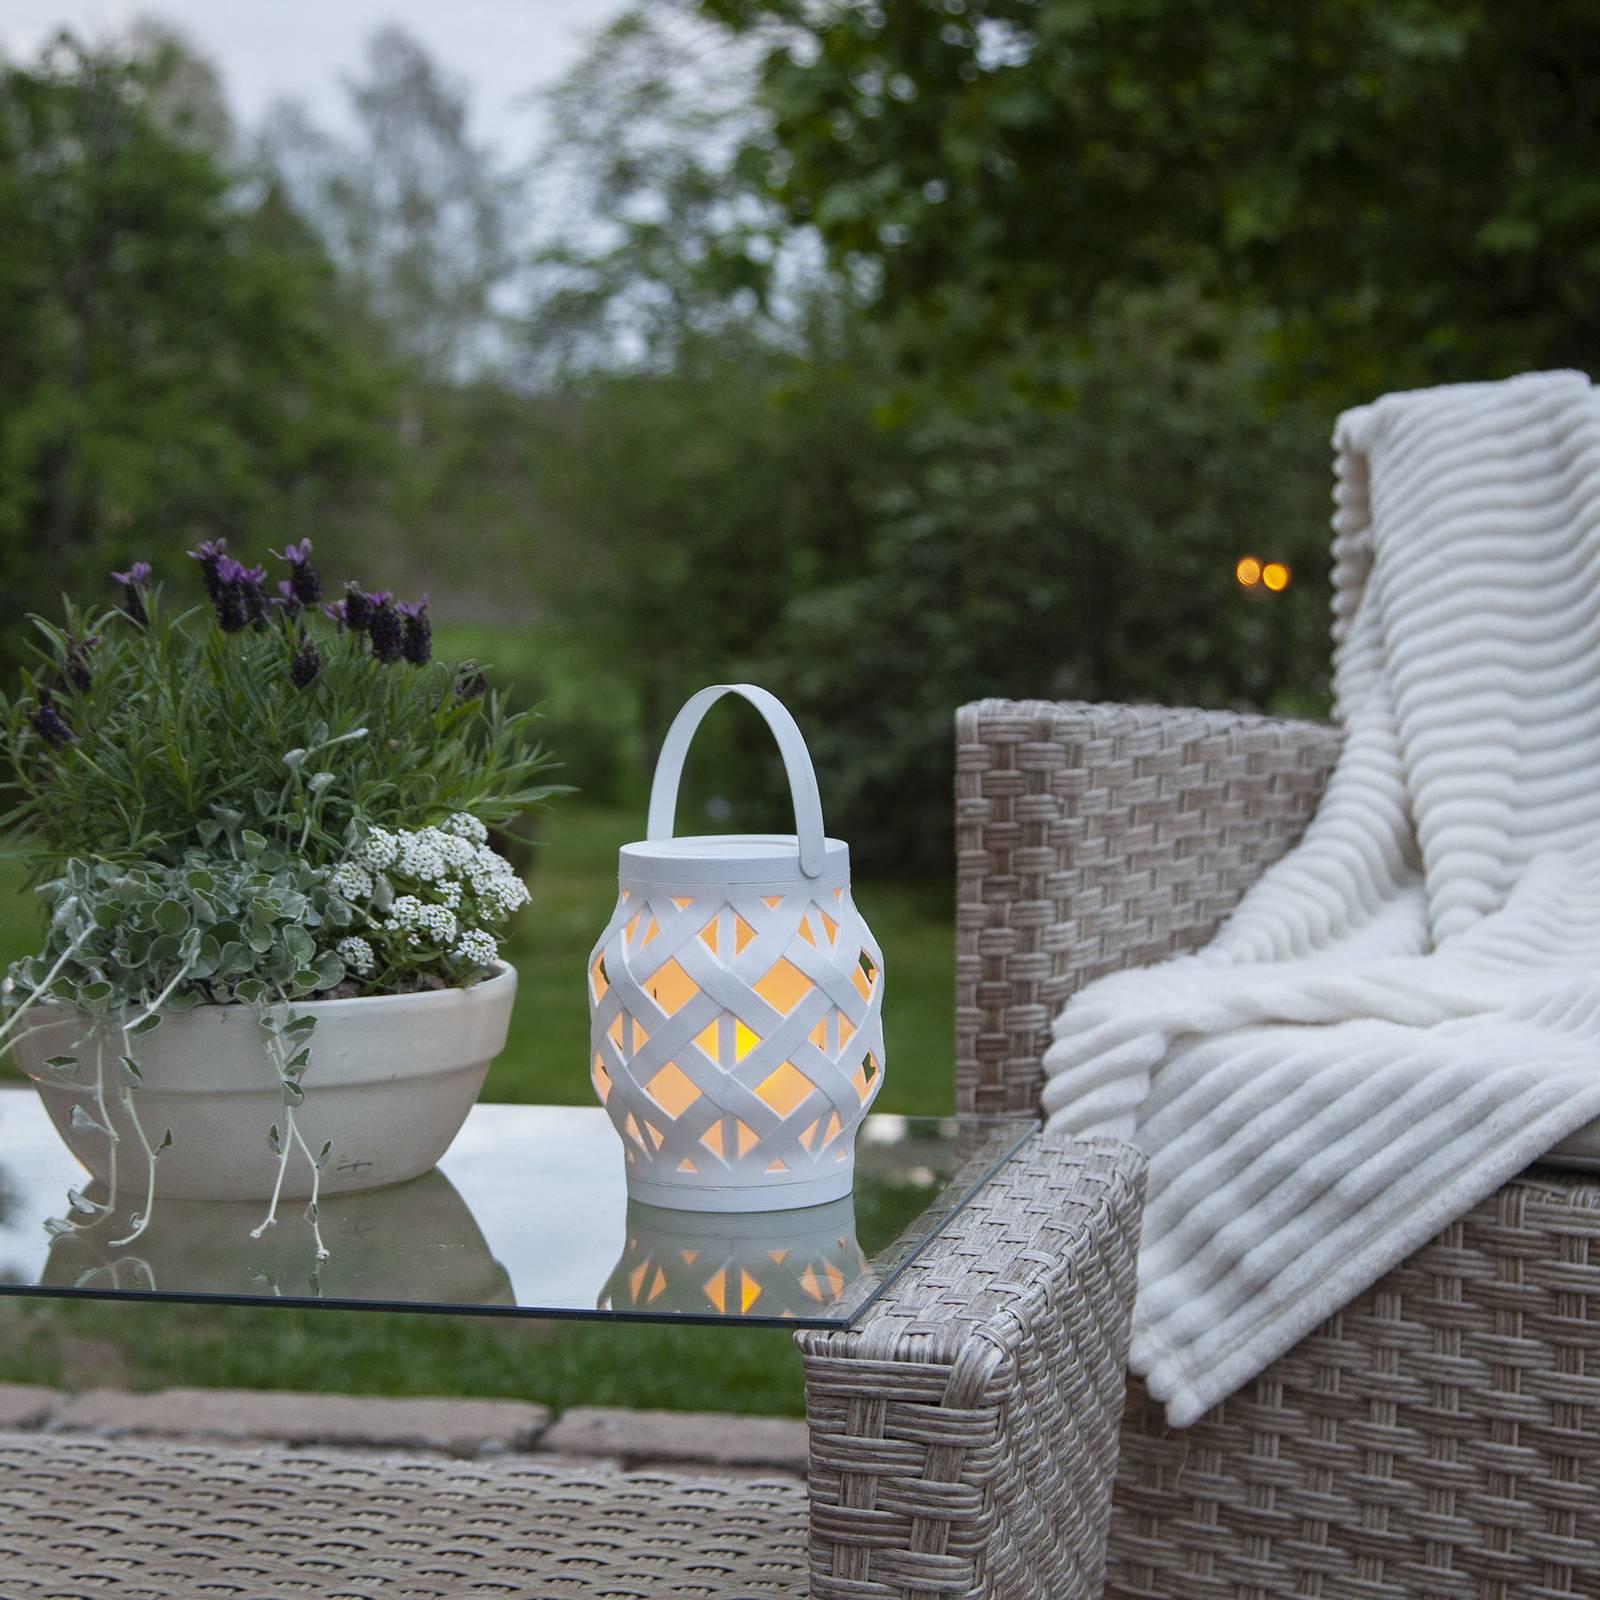 Flame Lantern -LED-lyhty, valkoinen, korkeus 16 cm